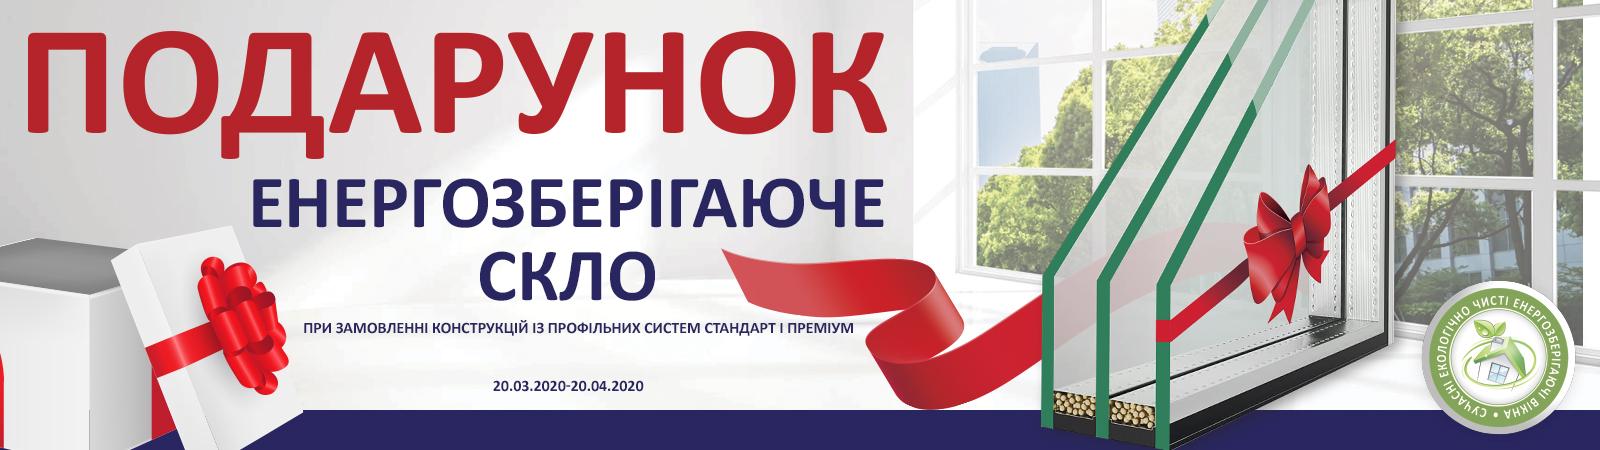 1600 450 ukr - Головна